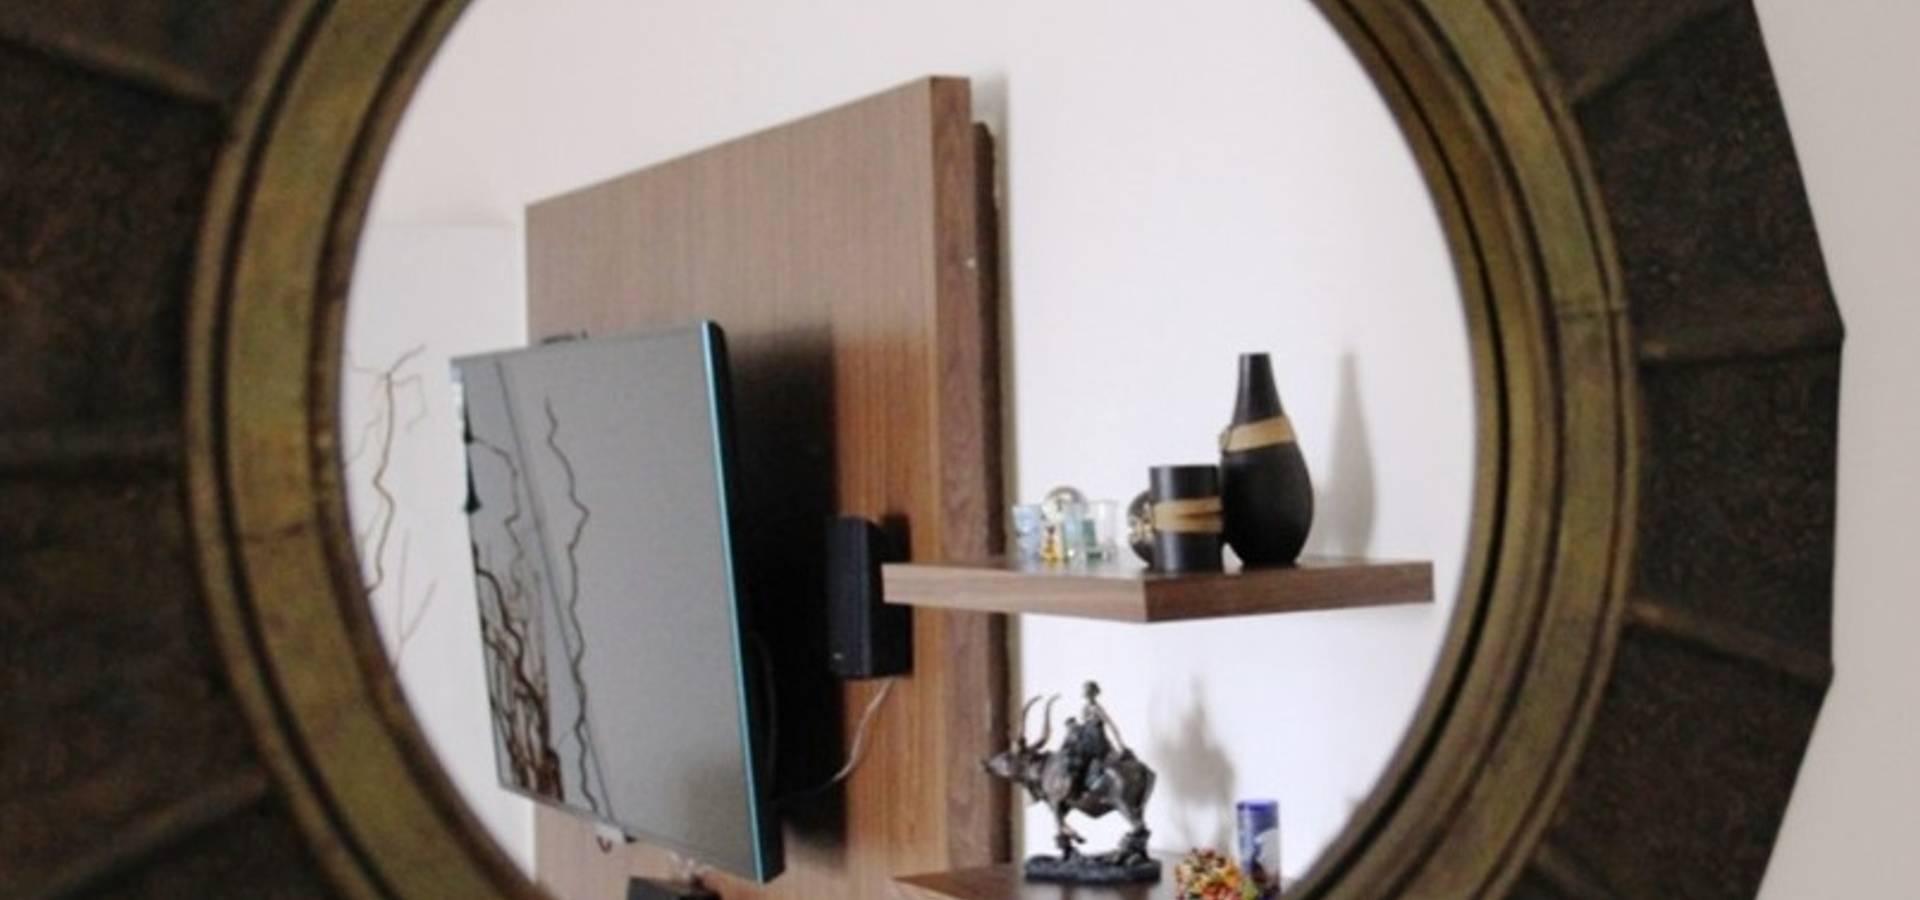 Interiors by ranjani